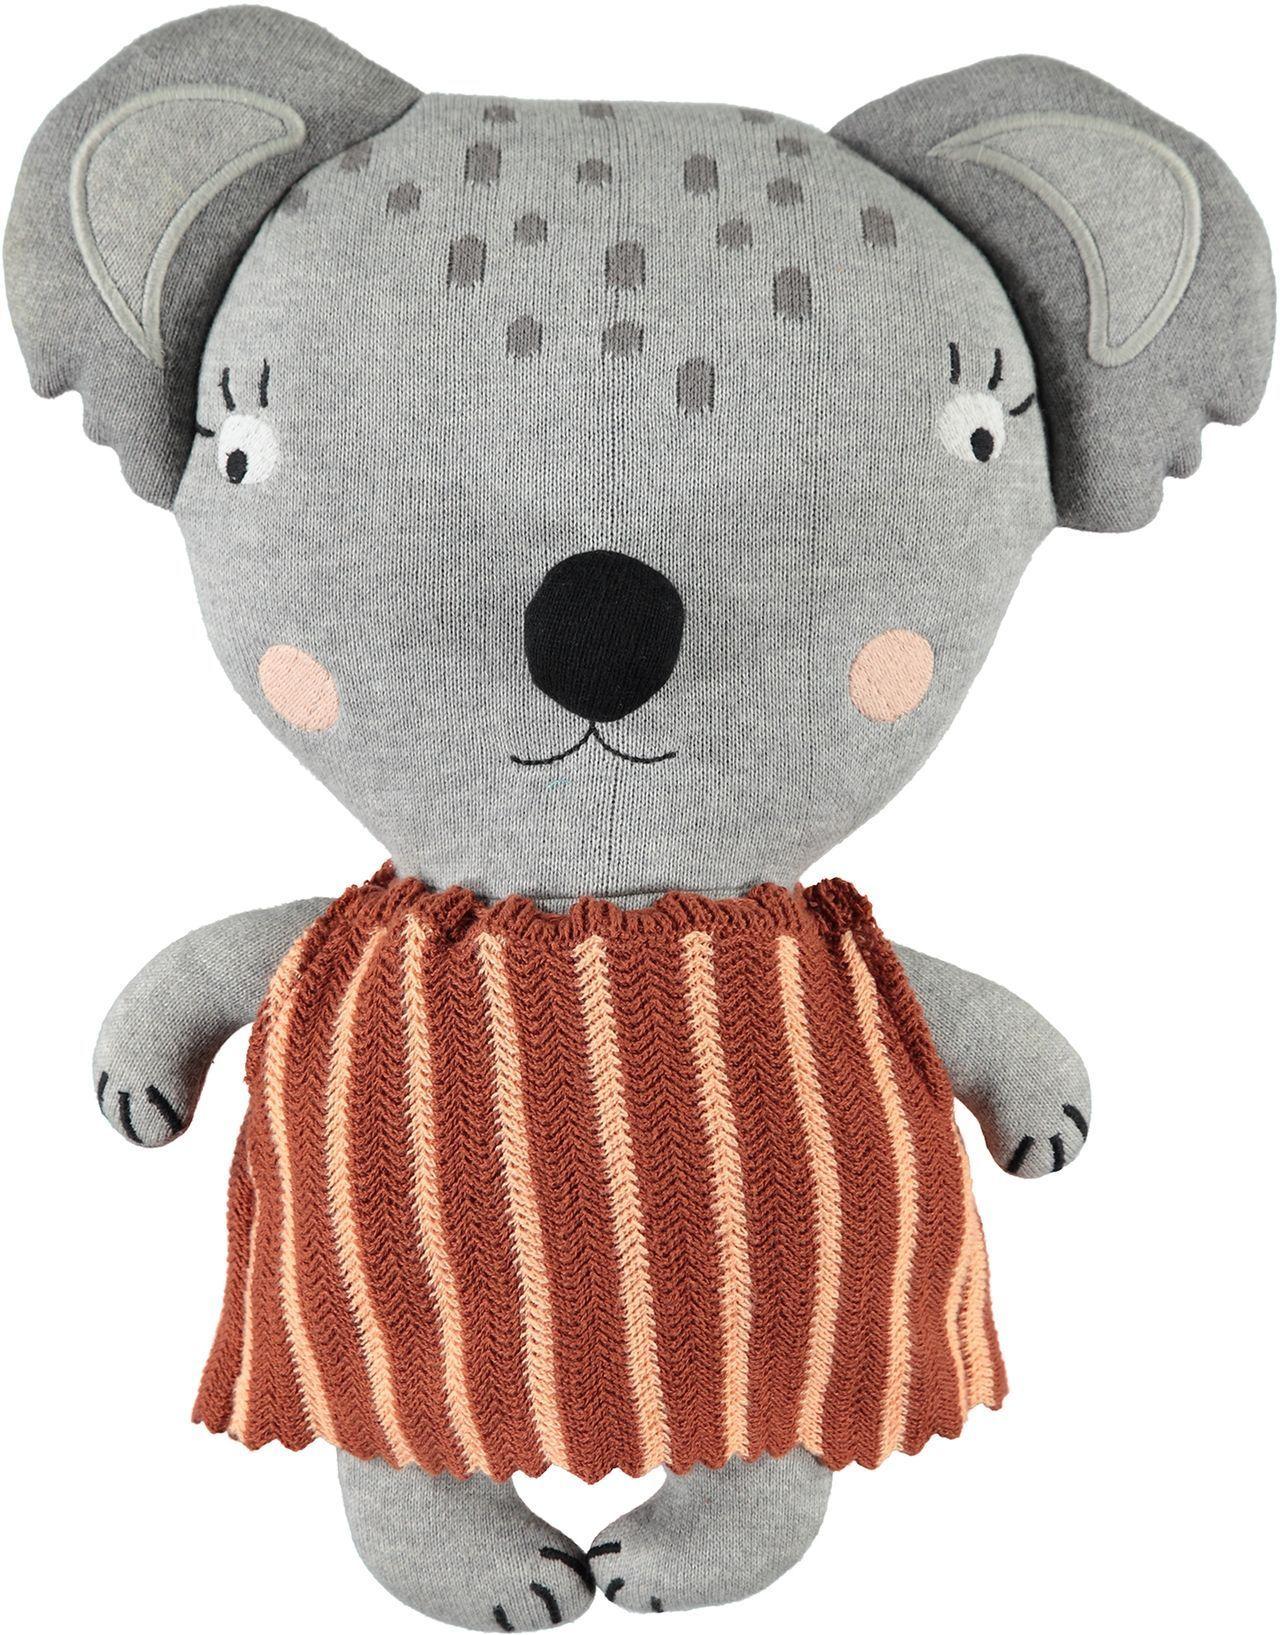 mami koala kissen von oyoy kaufen kleine fabriek